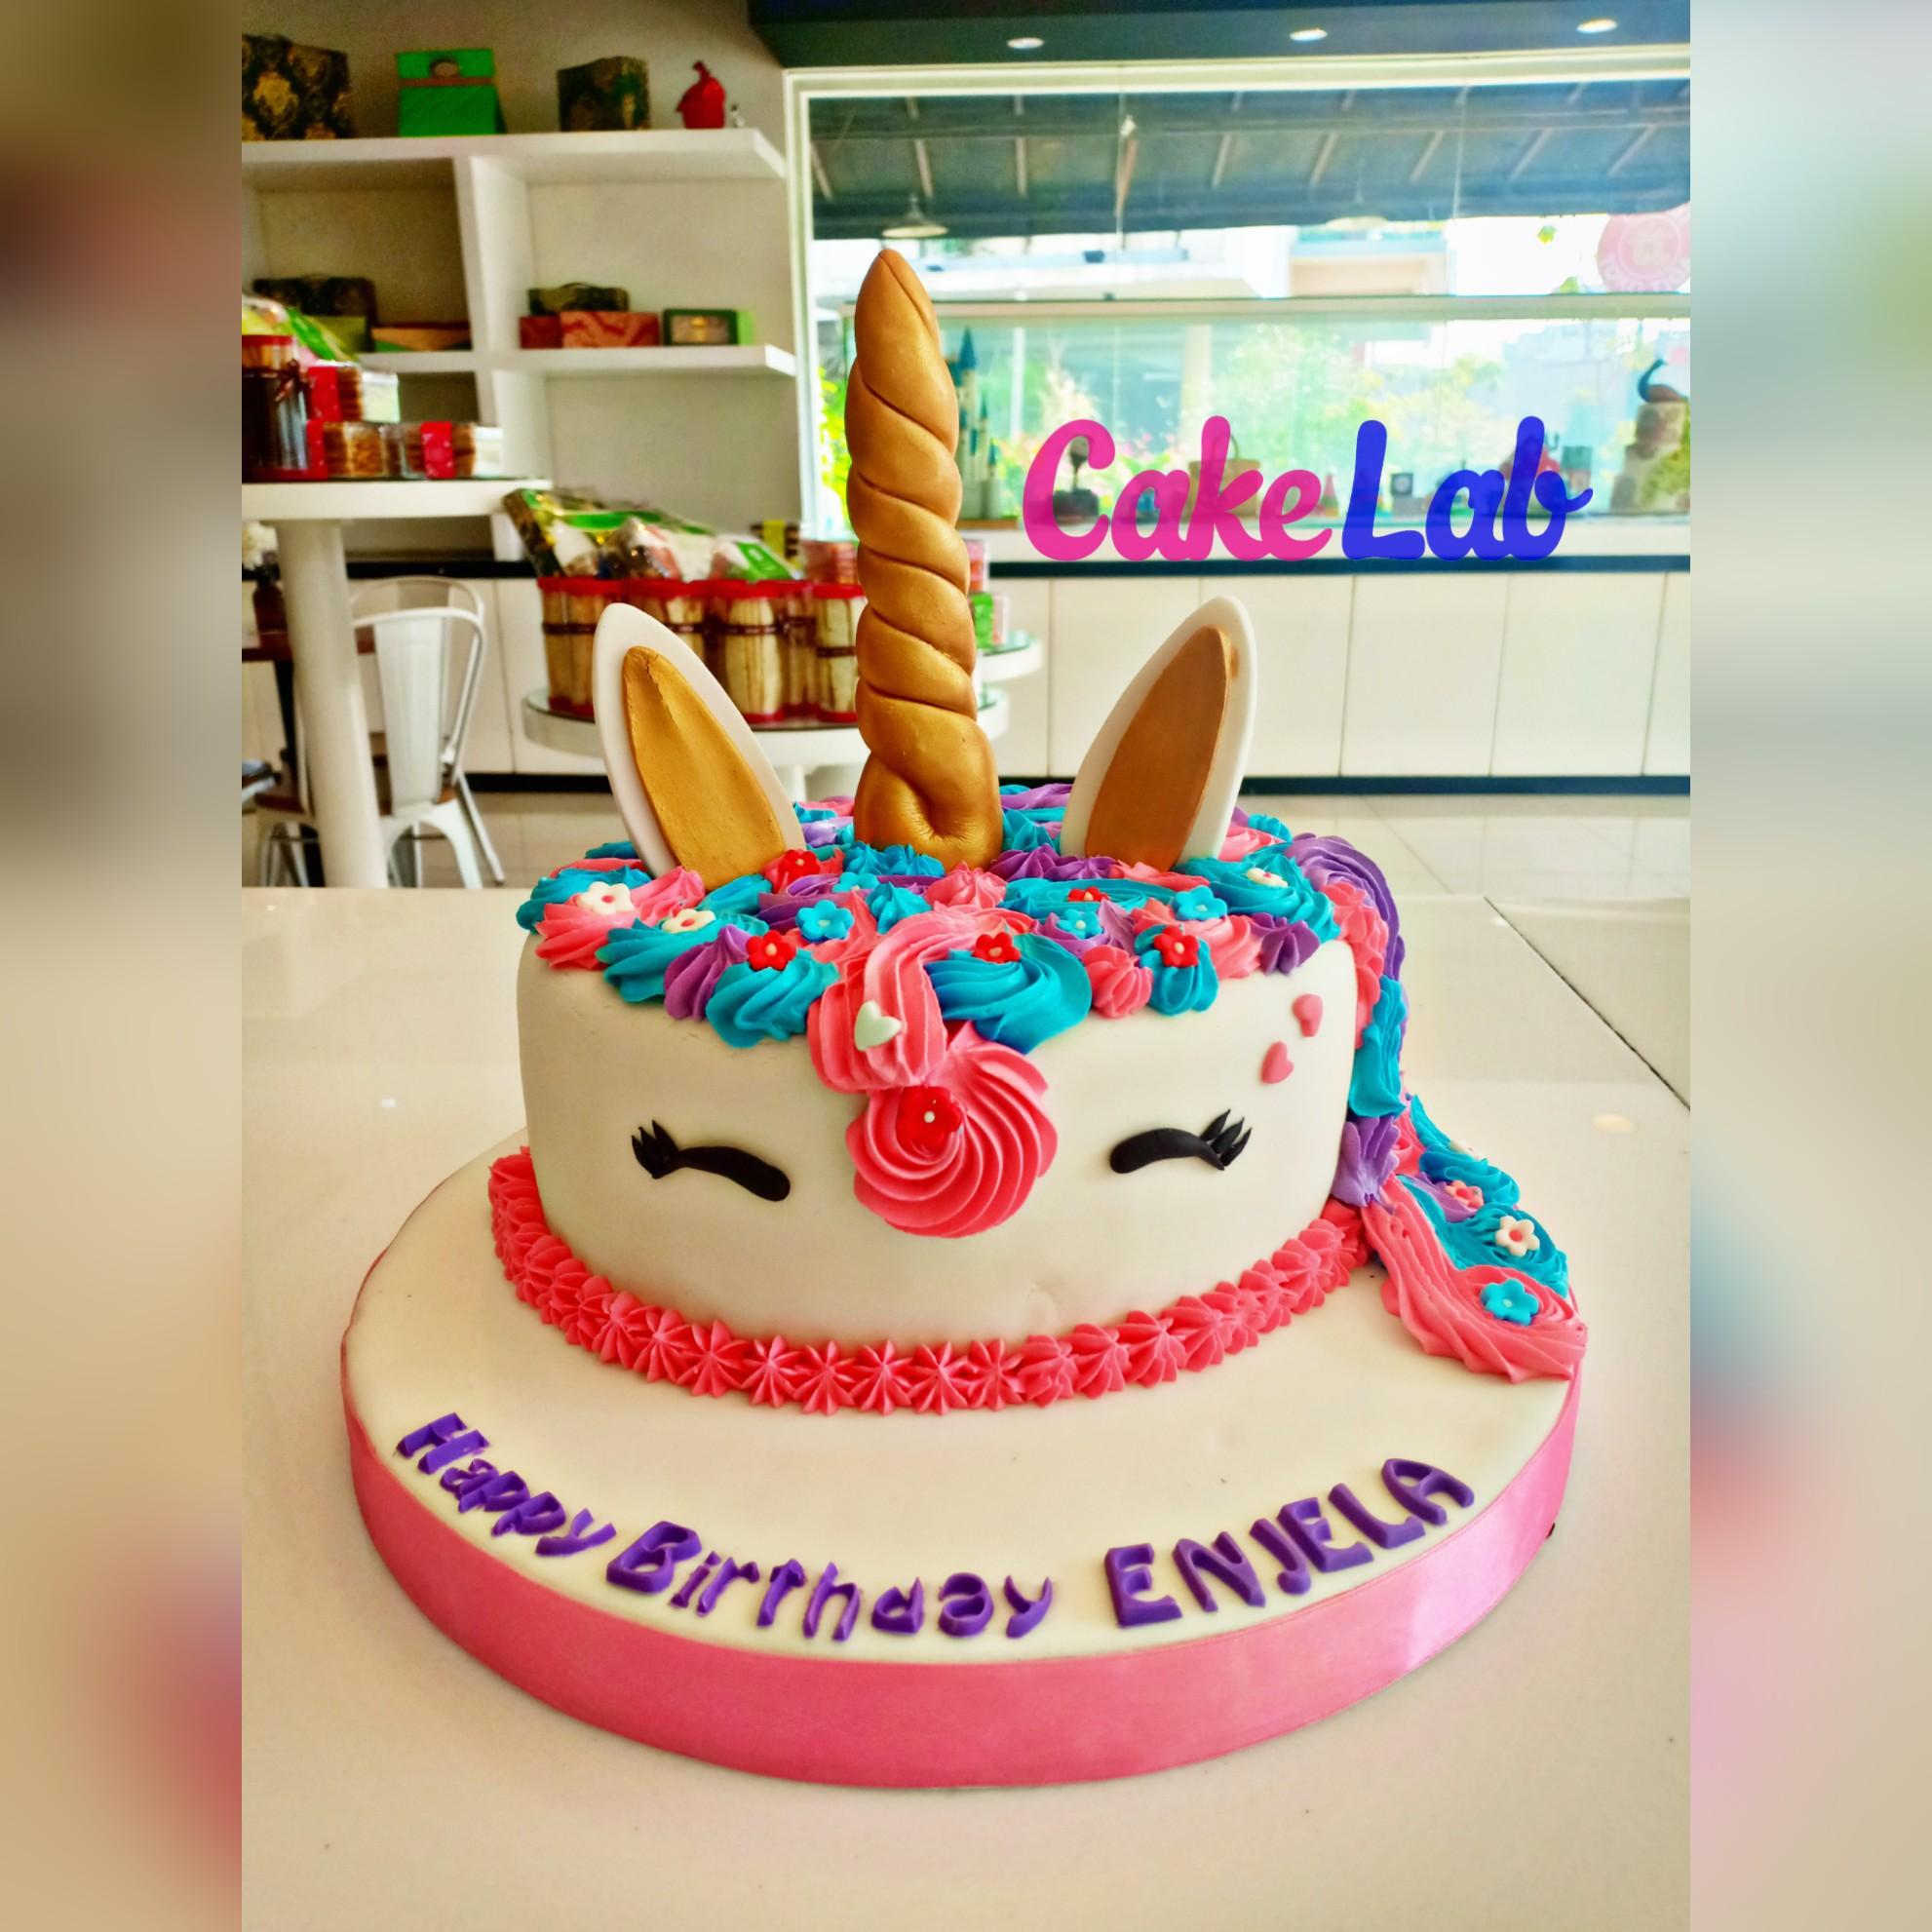 3D Cakes Jakarta, Best Birthday Cake Store | Cakelab Indonesia